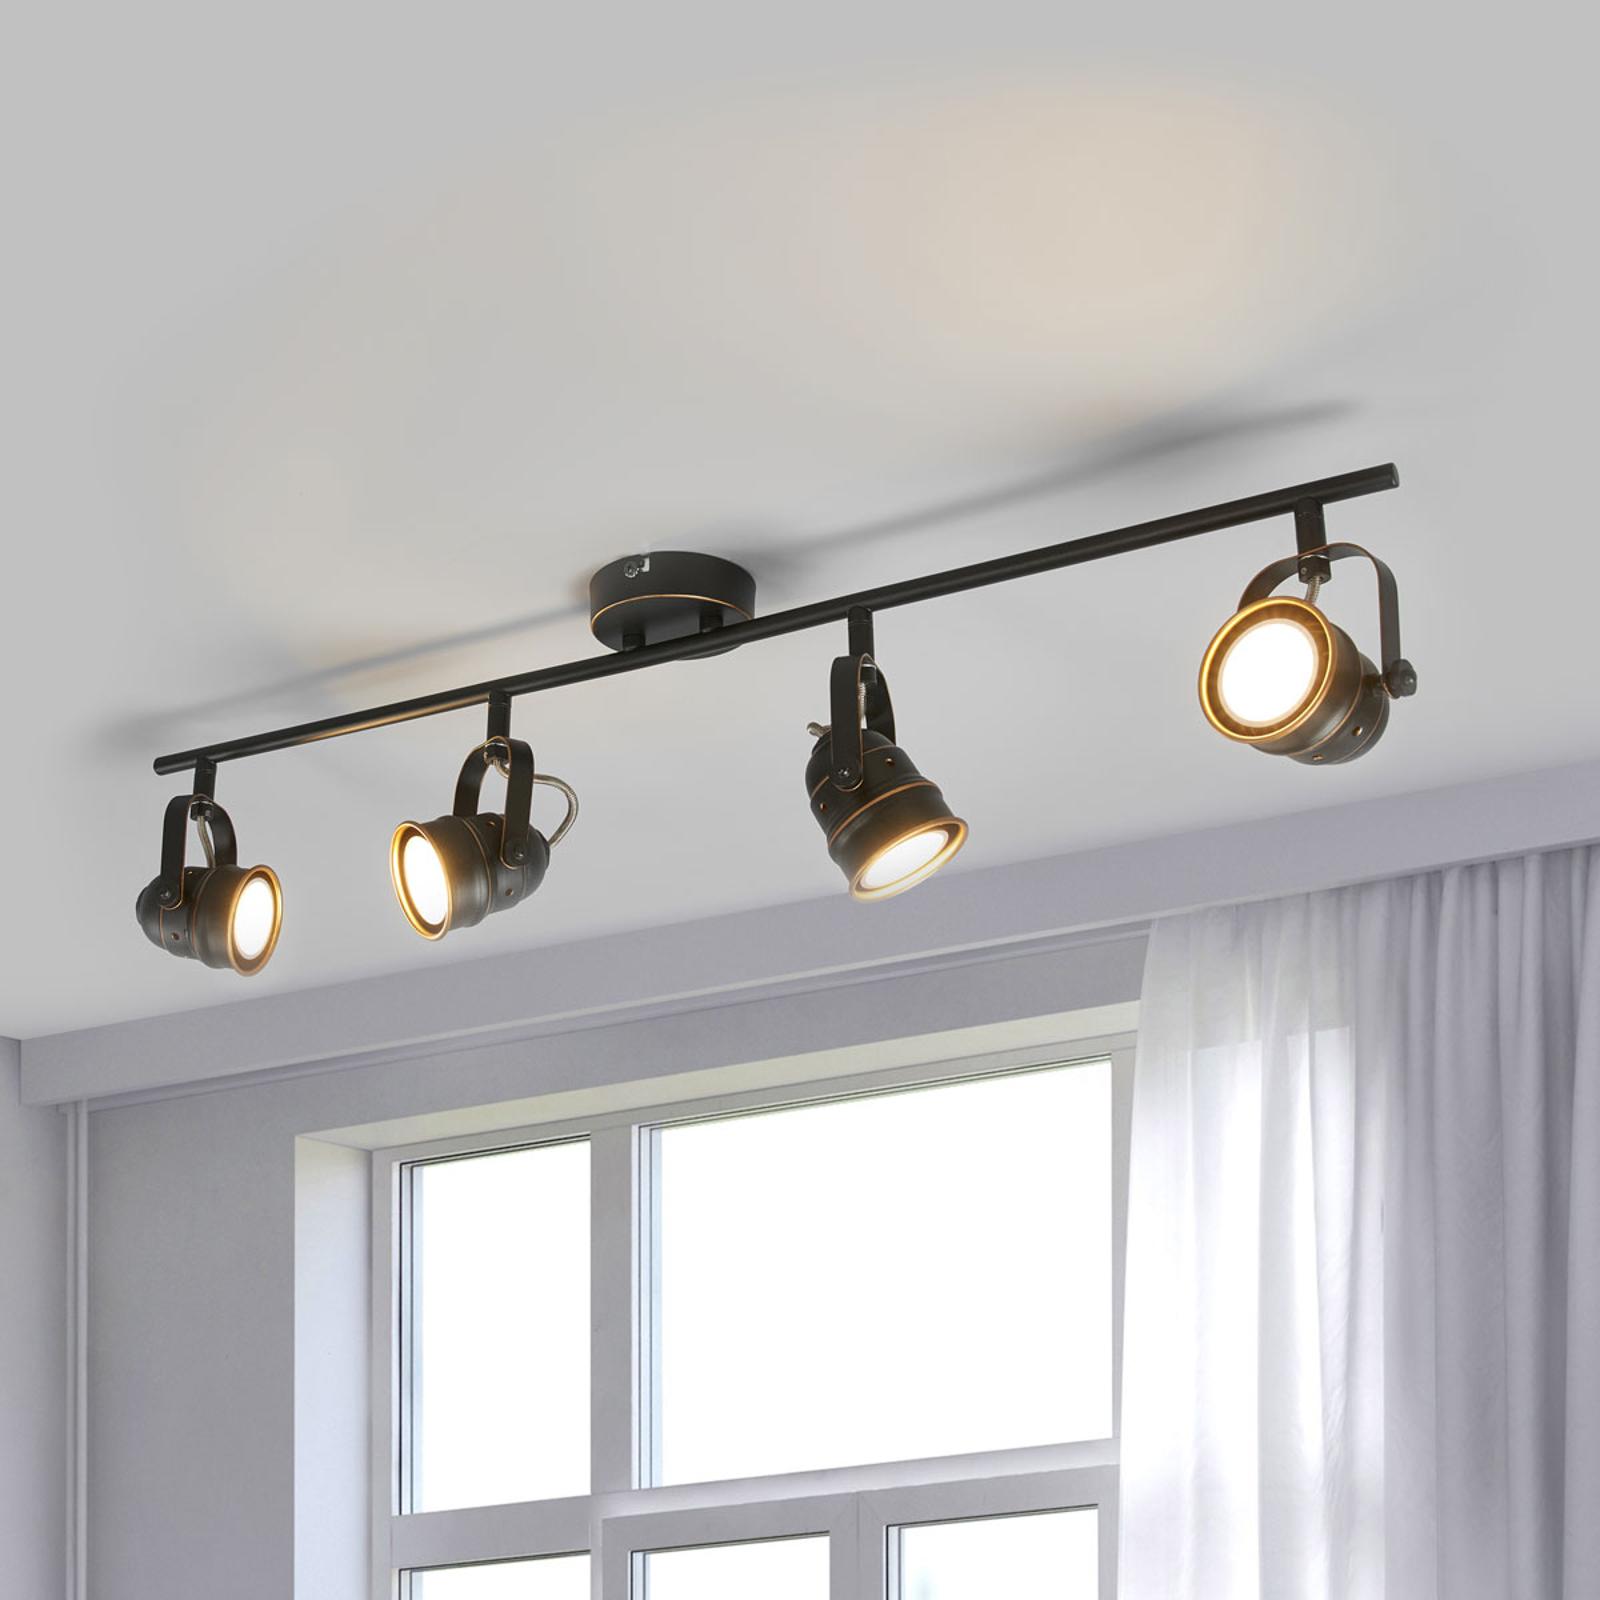 Four-bulb LED ceiling lamp Leonor, black-gold_9639068_1